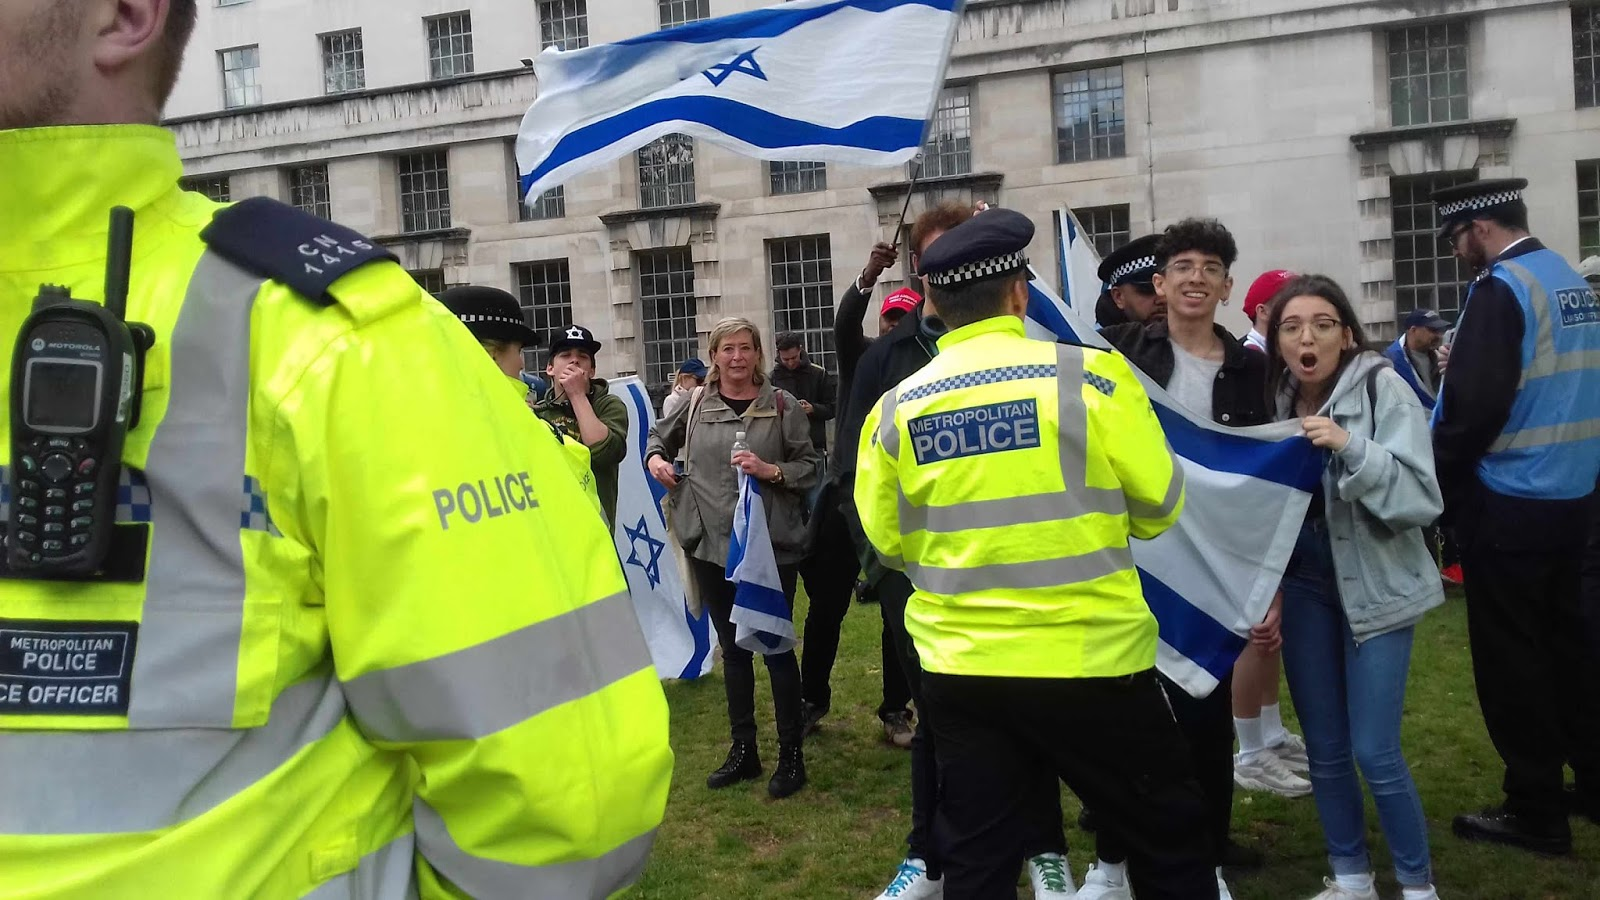 Tony Greenstein Blog: Tony Greenstein's Blog: 15,000 March In Memory Of Nakba